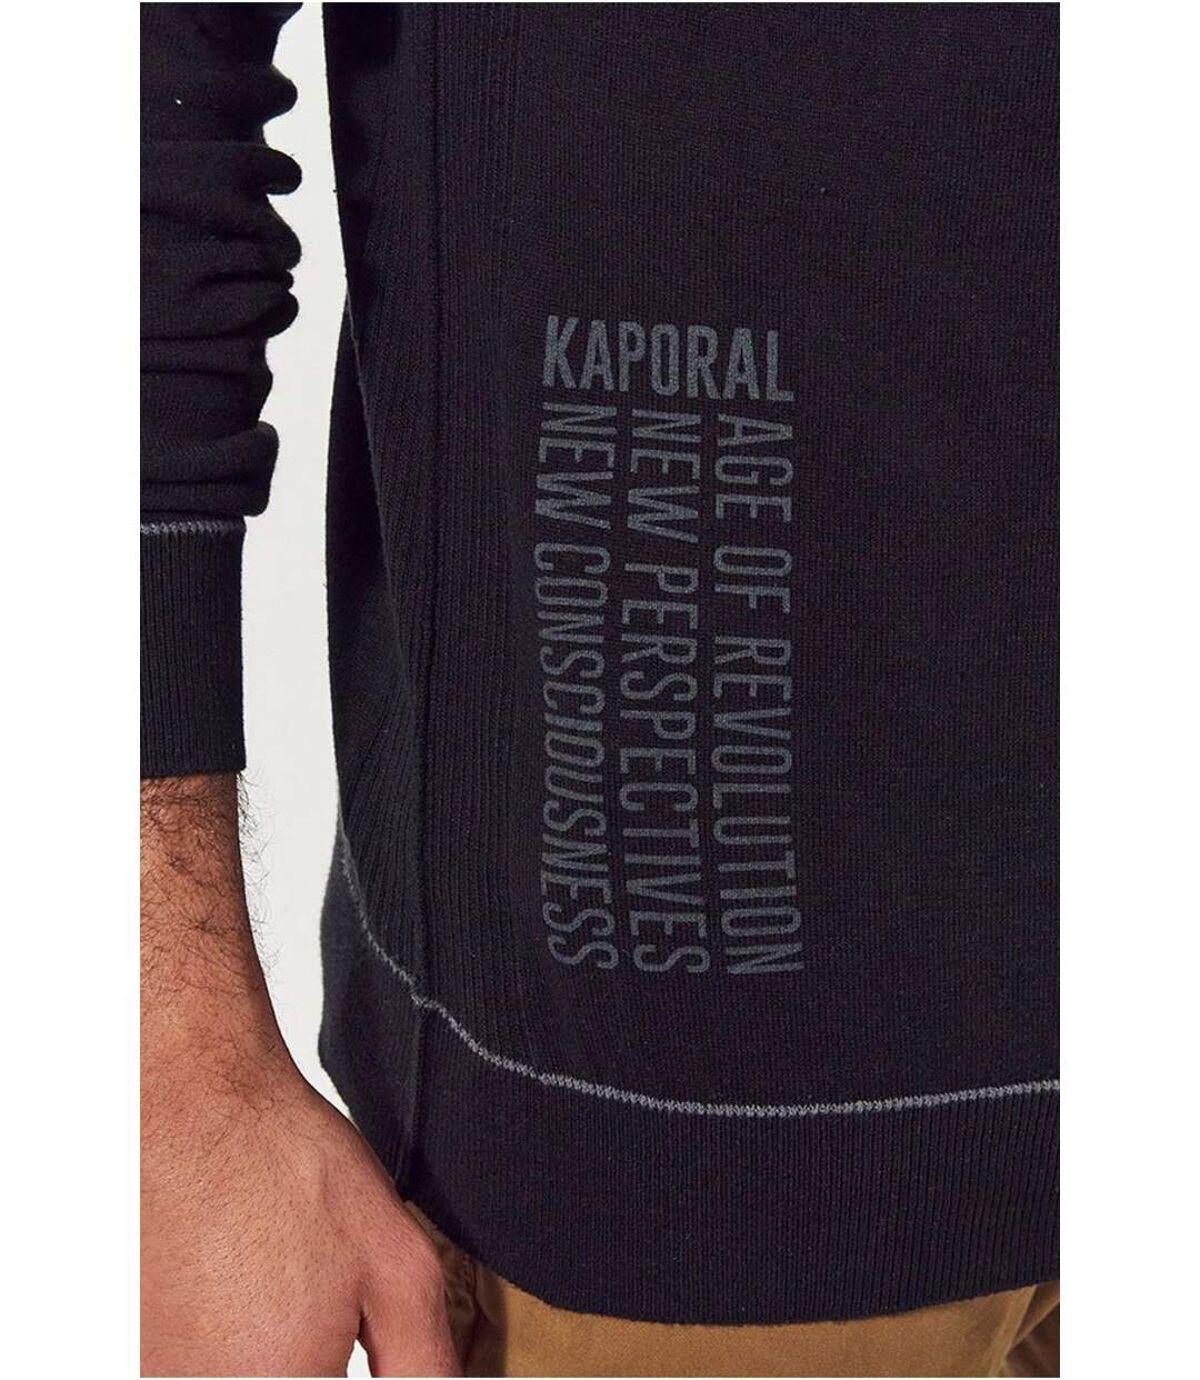 Pull coton bio  -  Kaporal - Homme